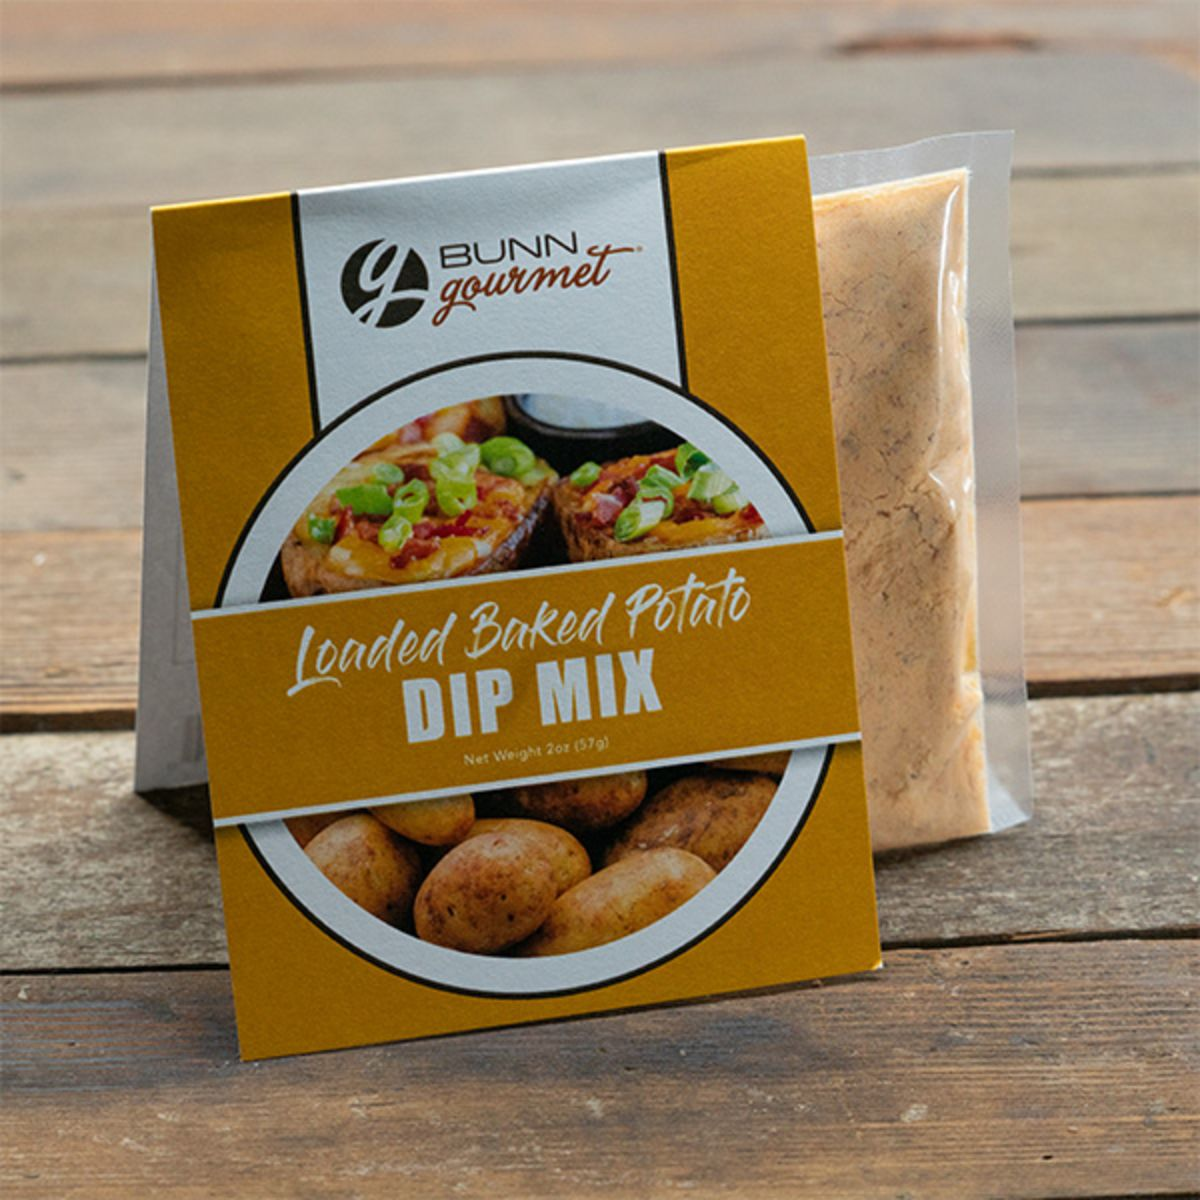 Loaded Baked Potato Cook & Serve Dip Mix